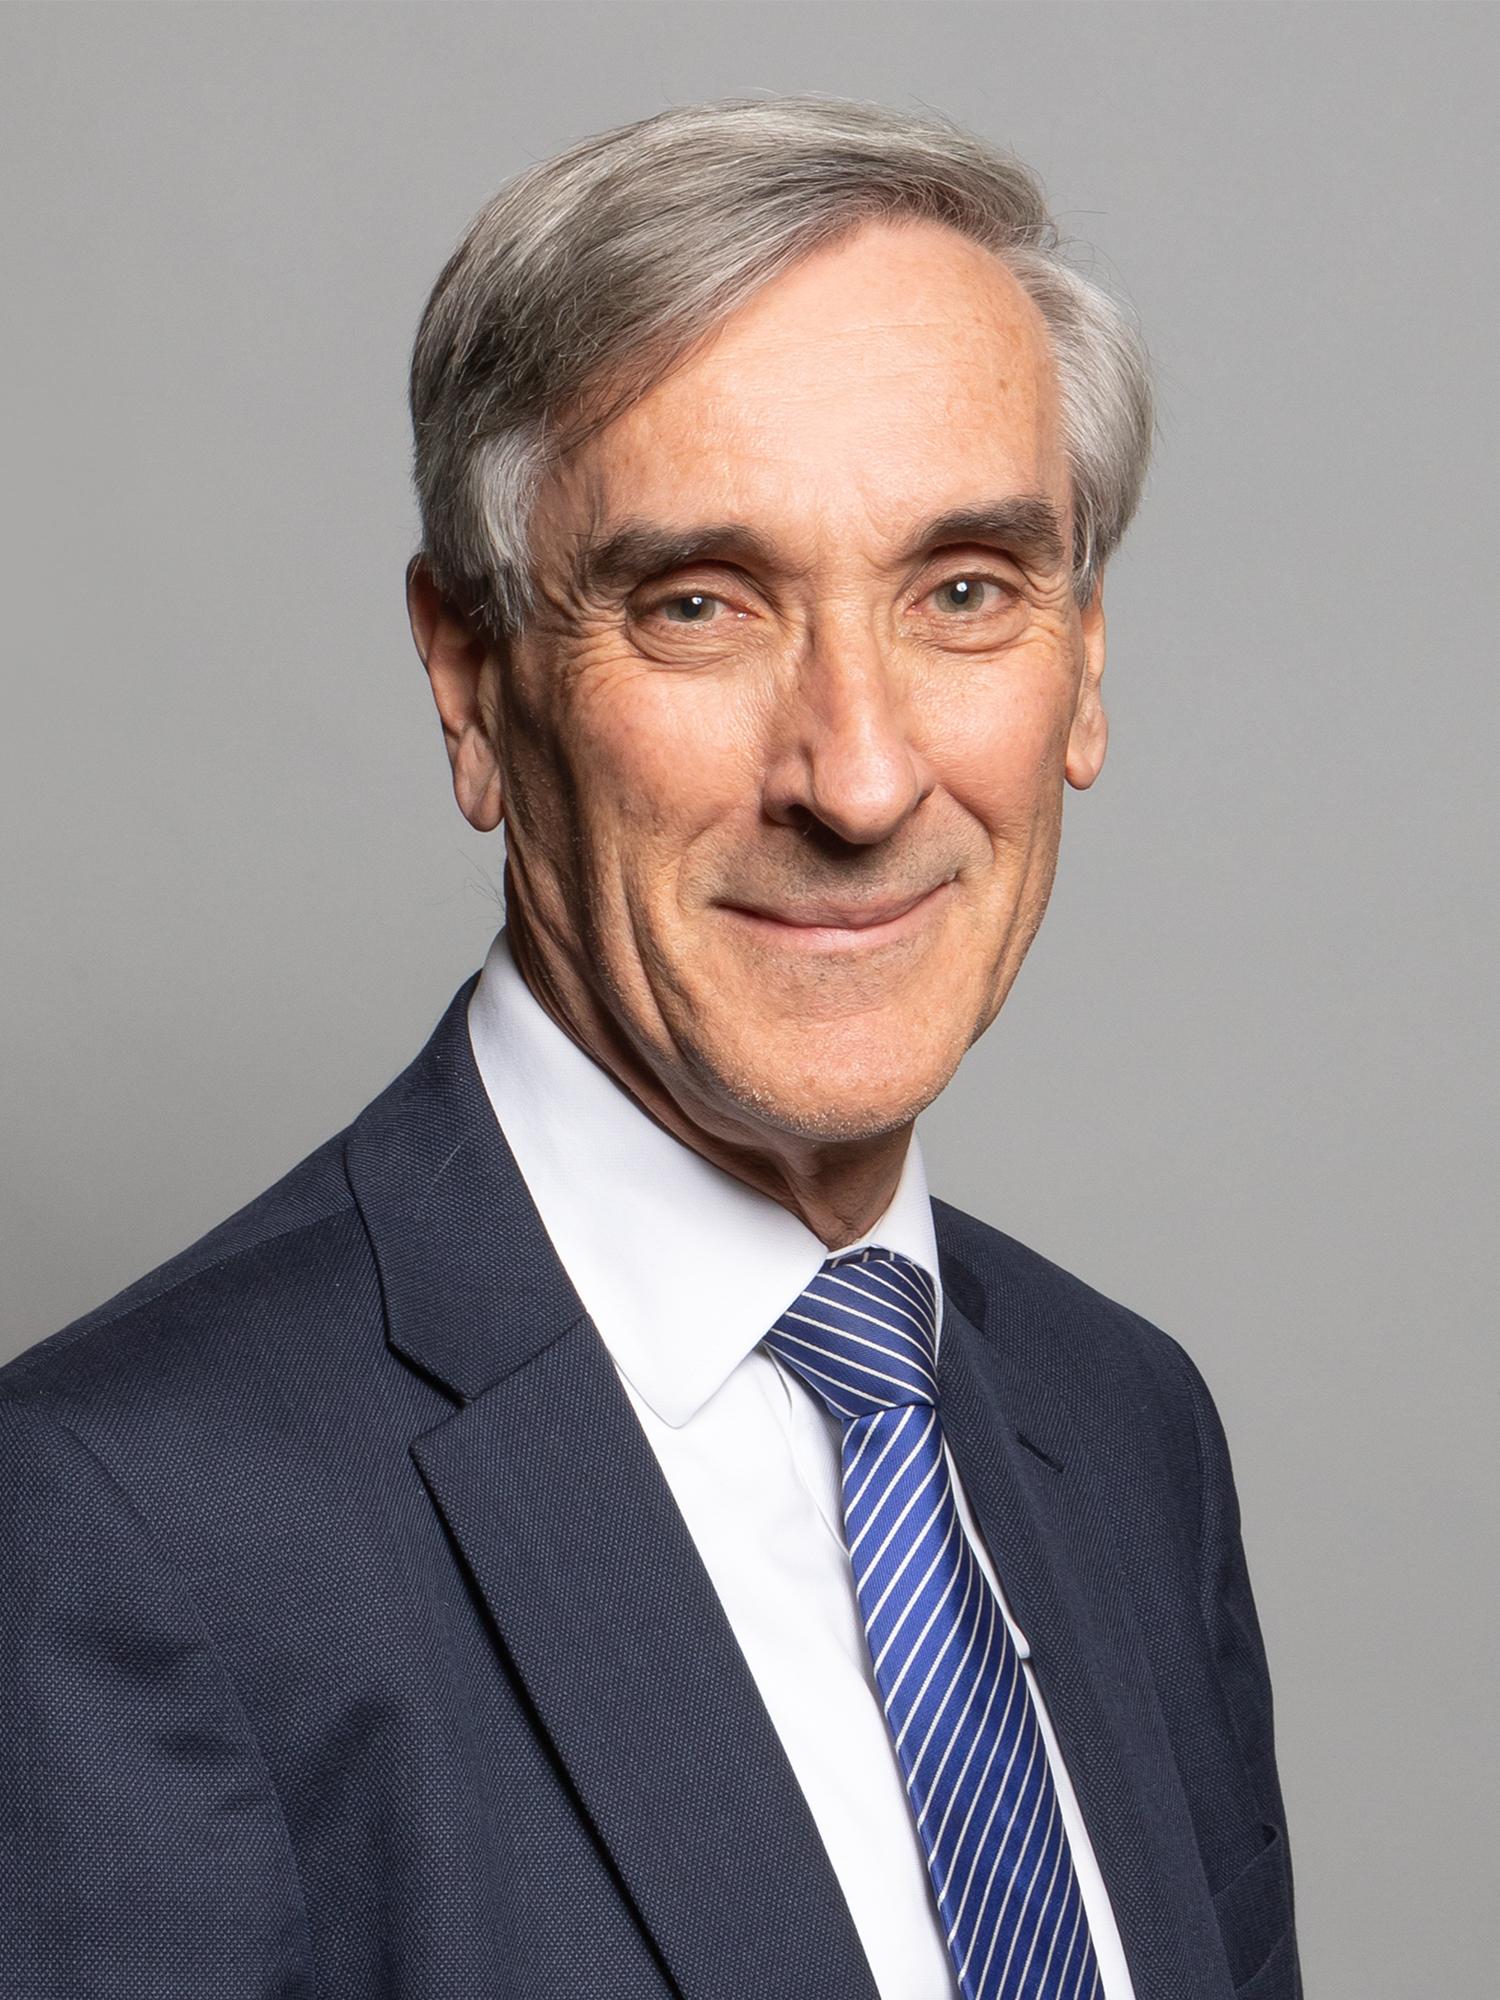 John Redwood - Wikipedia